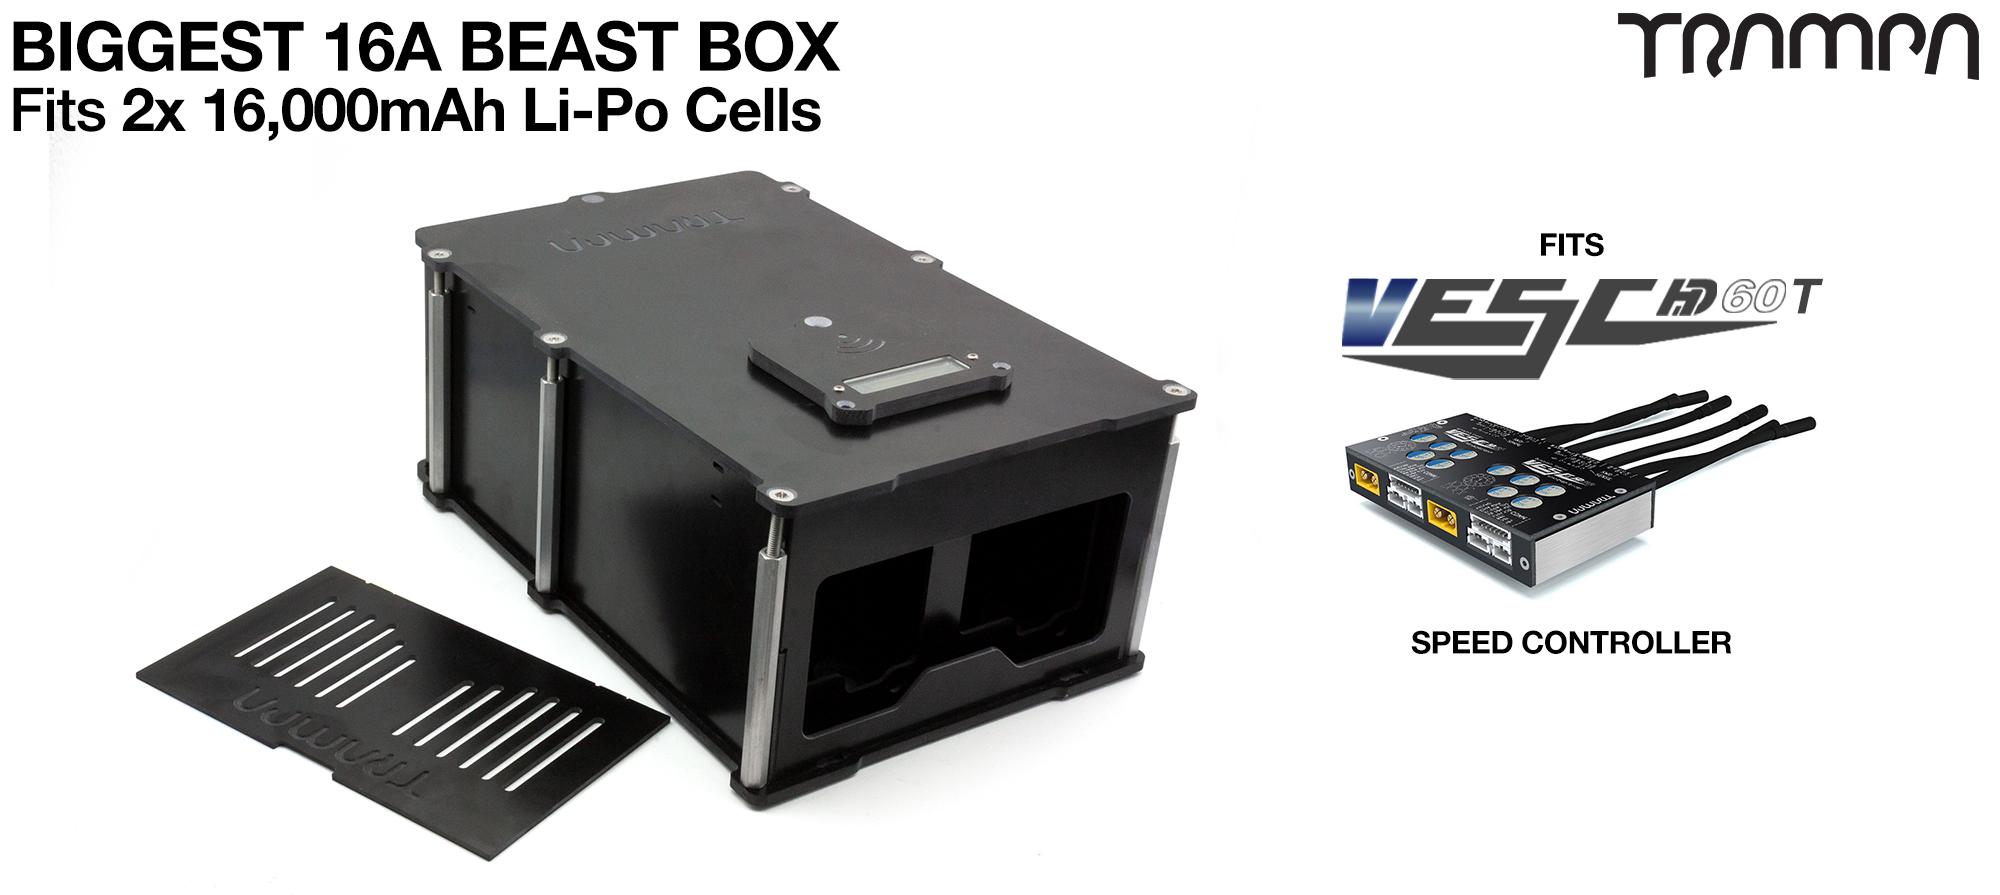 16A BIGGEST BEAST Box fits 2x 6s 16A cells with Internal VESC Housing that fits 1x HD-60T - TWIN Motor